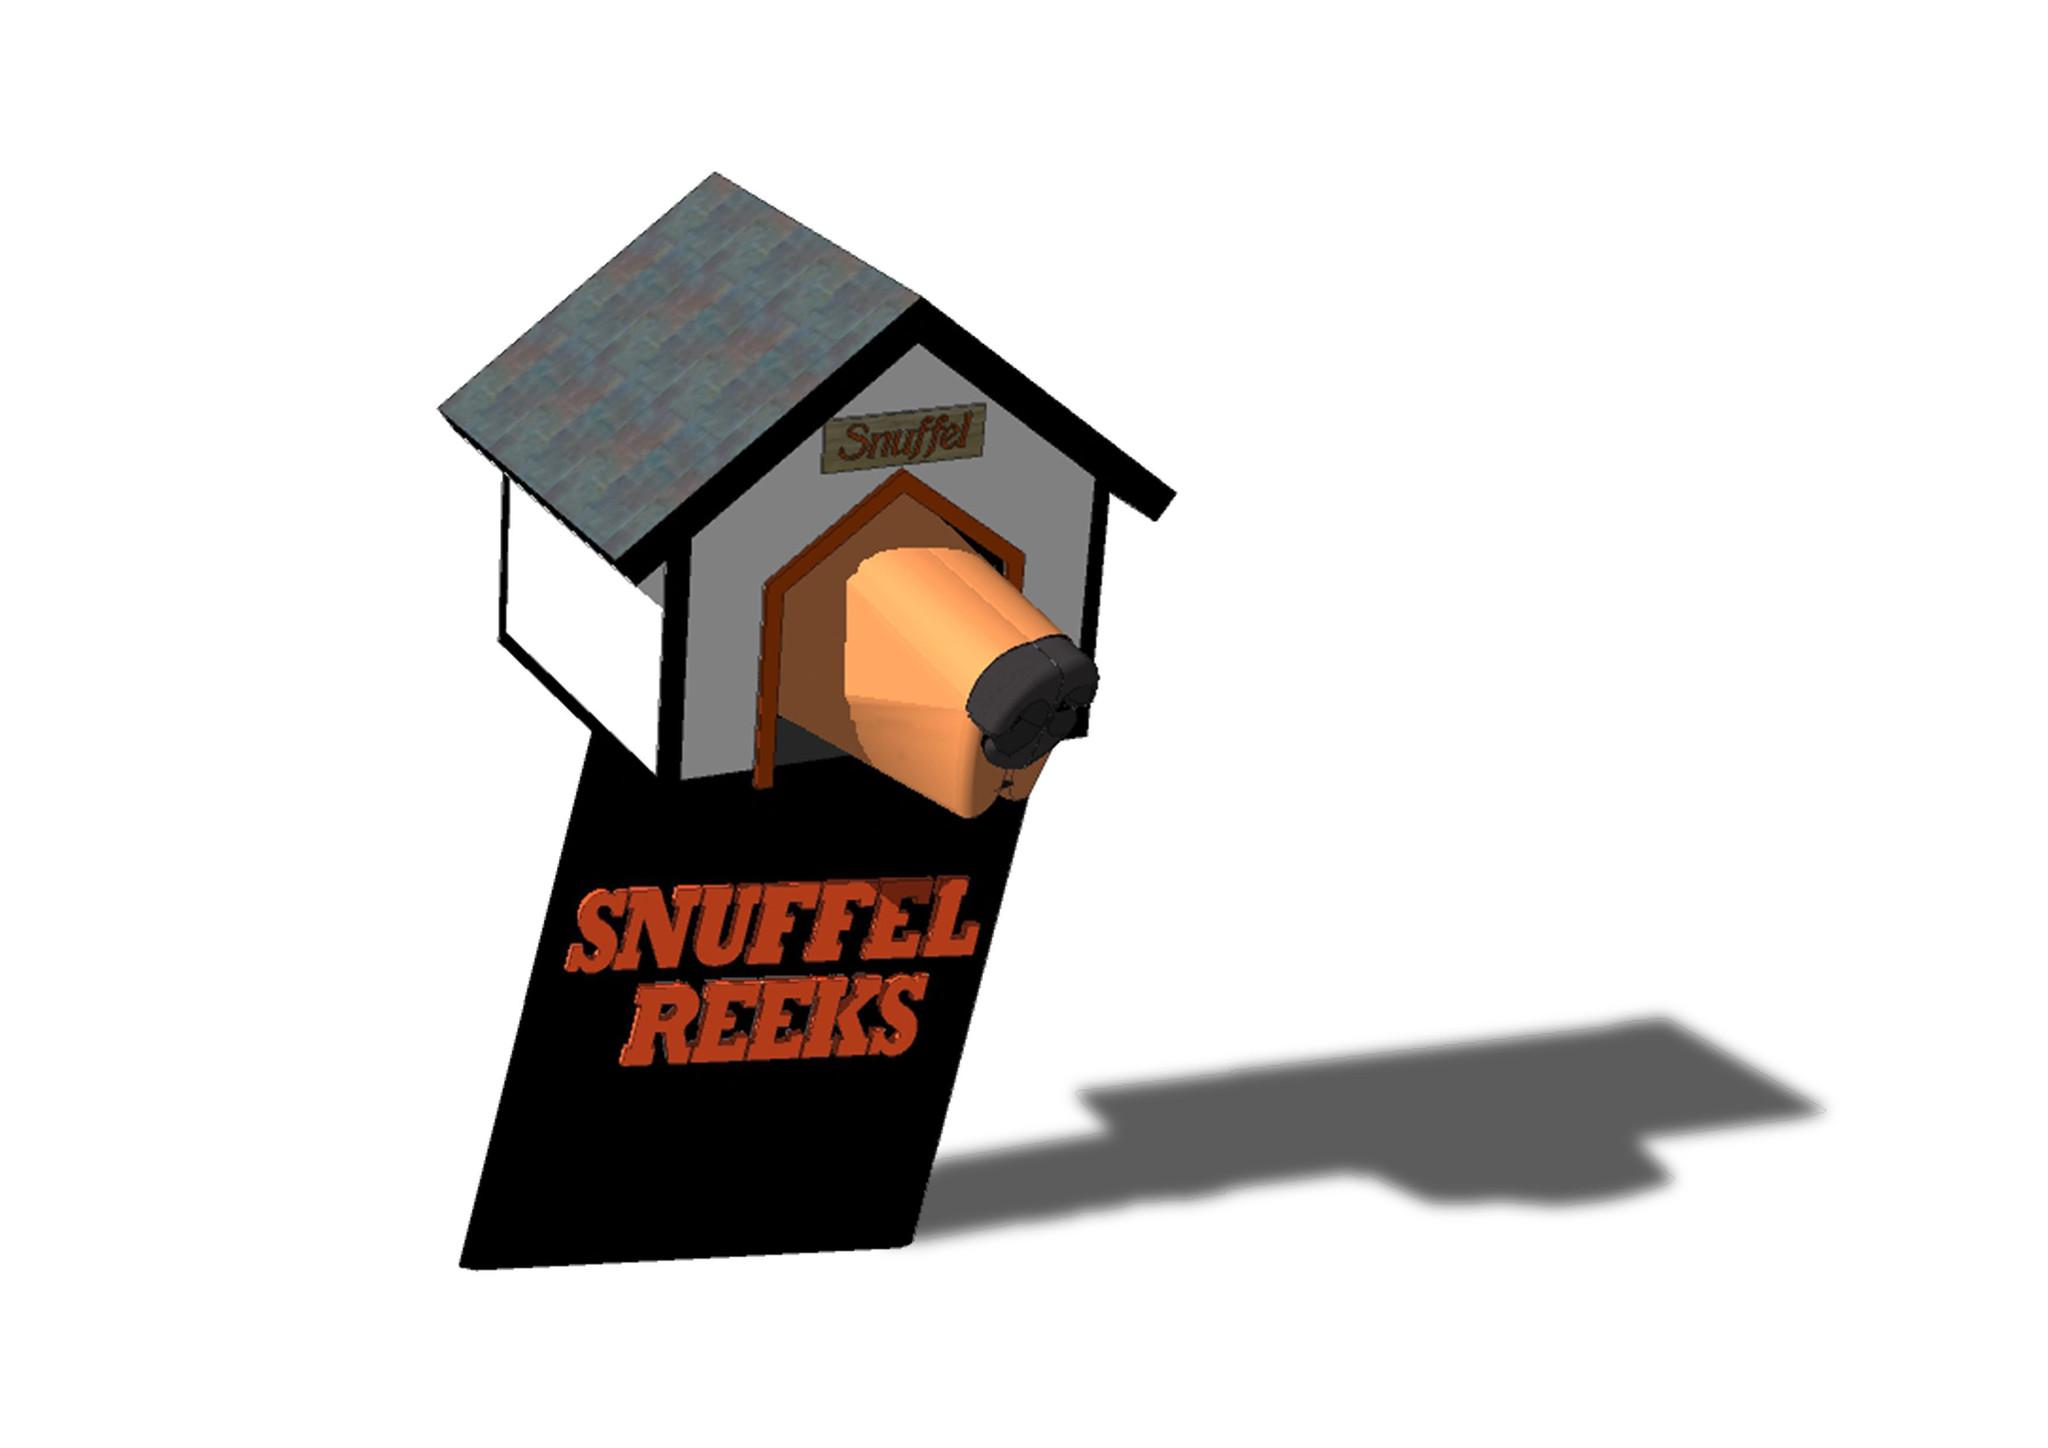 snuffel-reeks logo